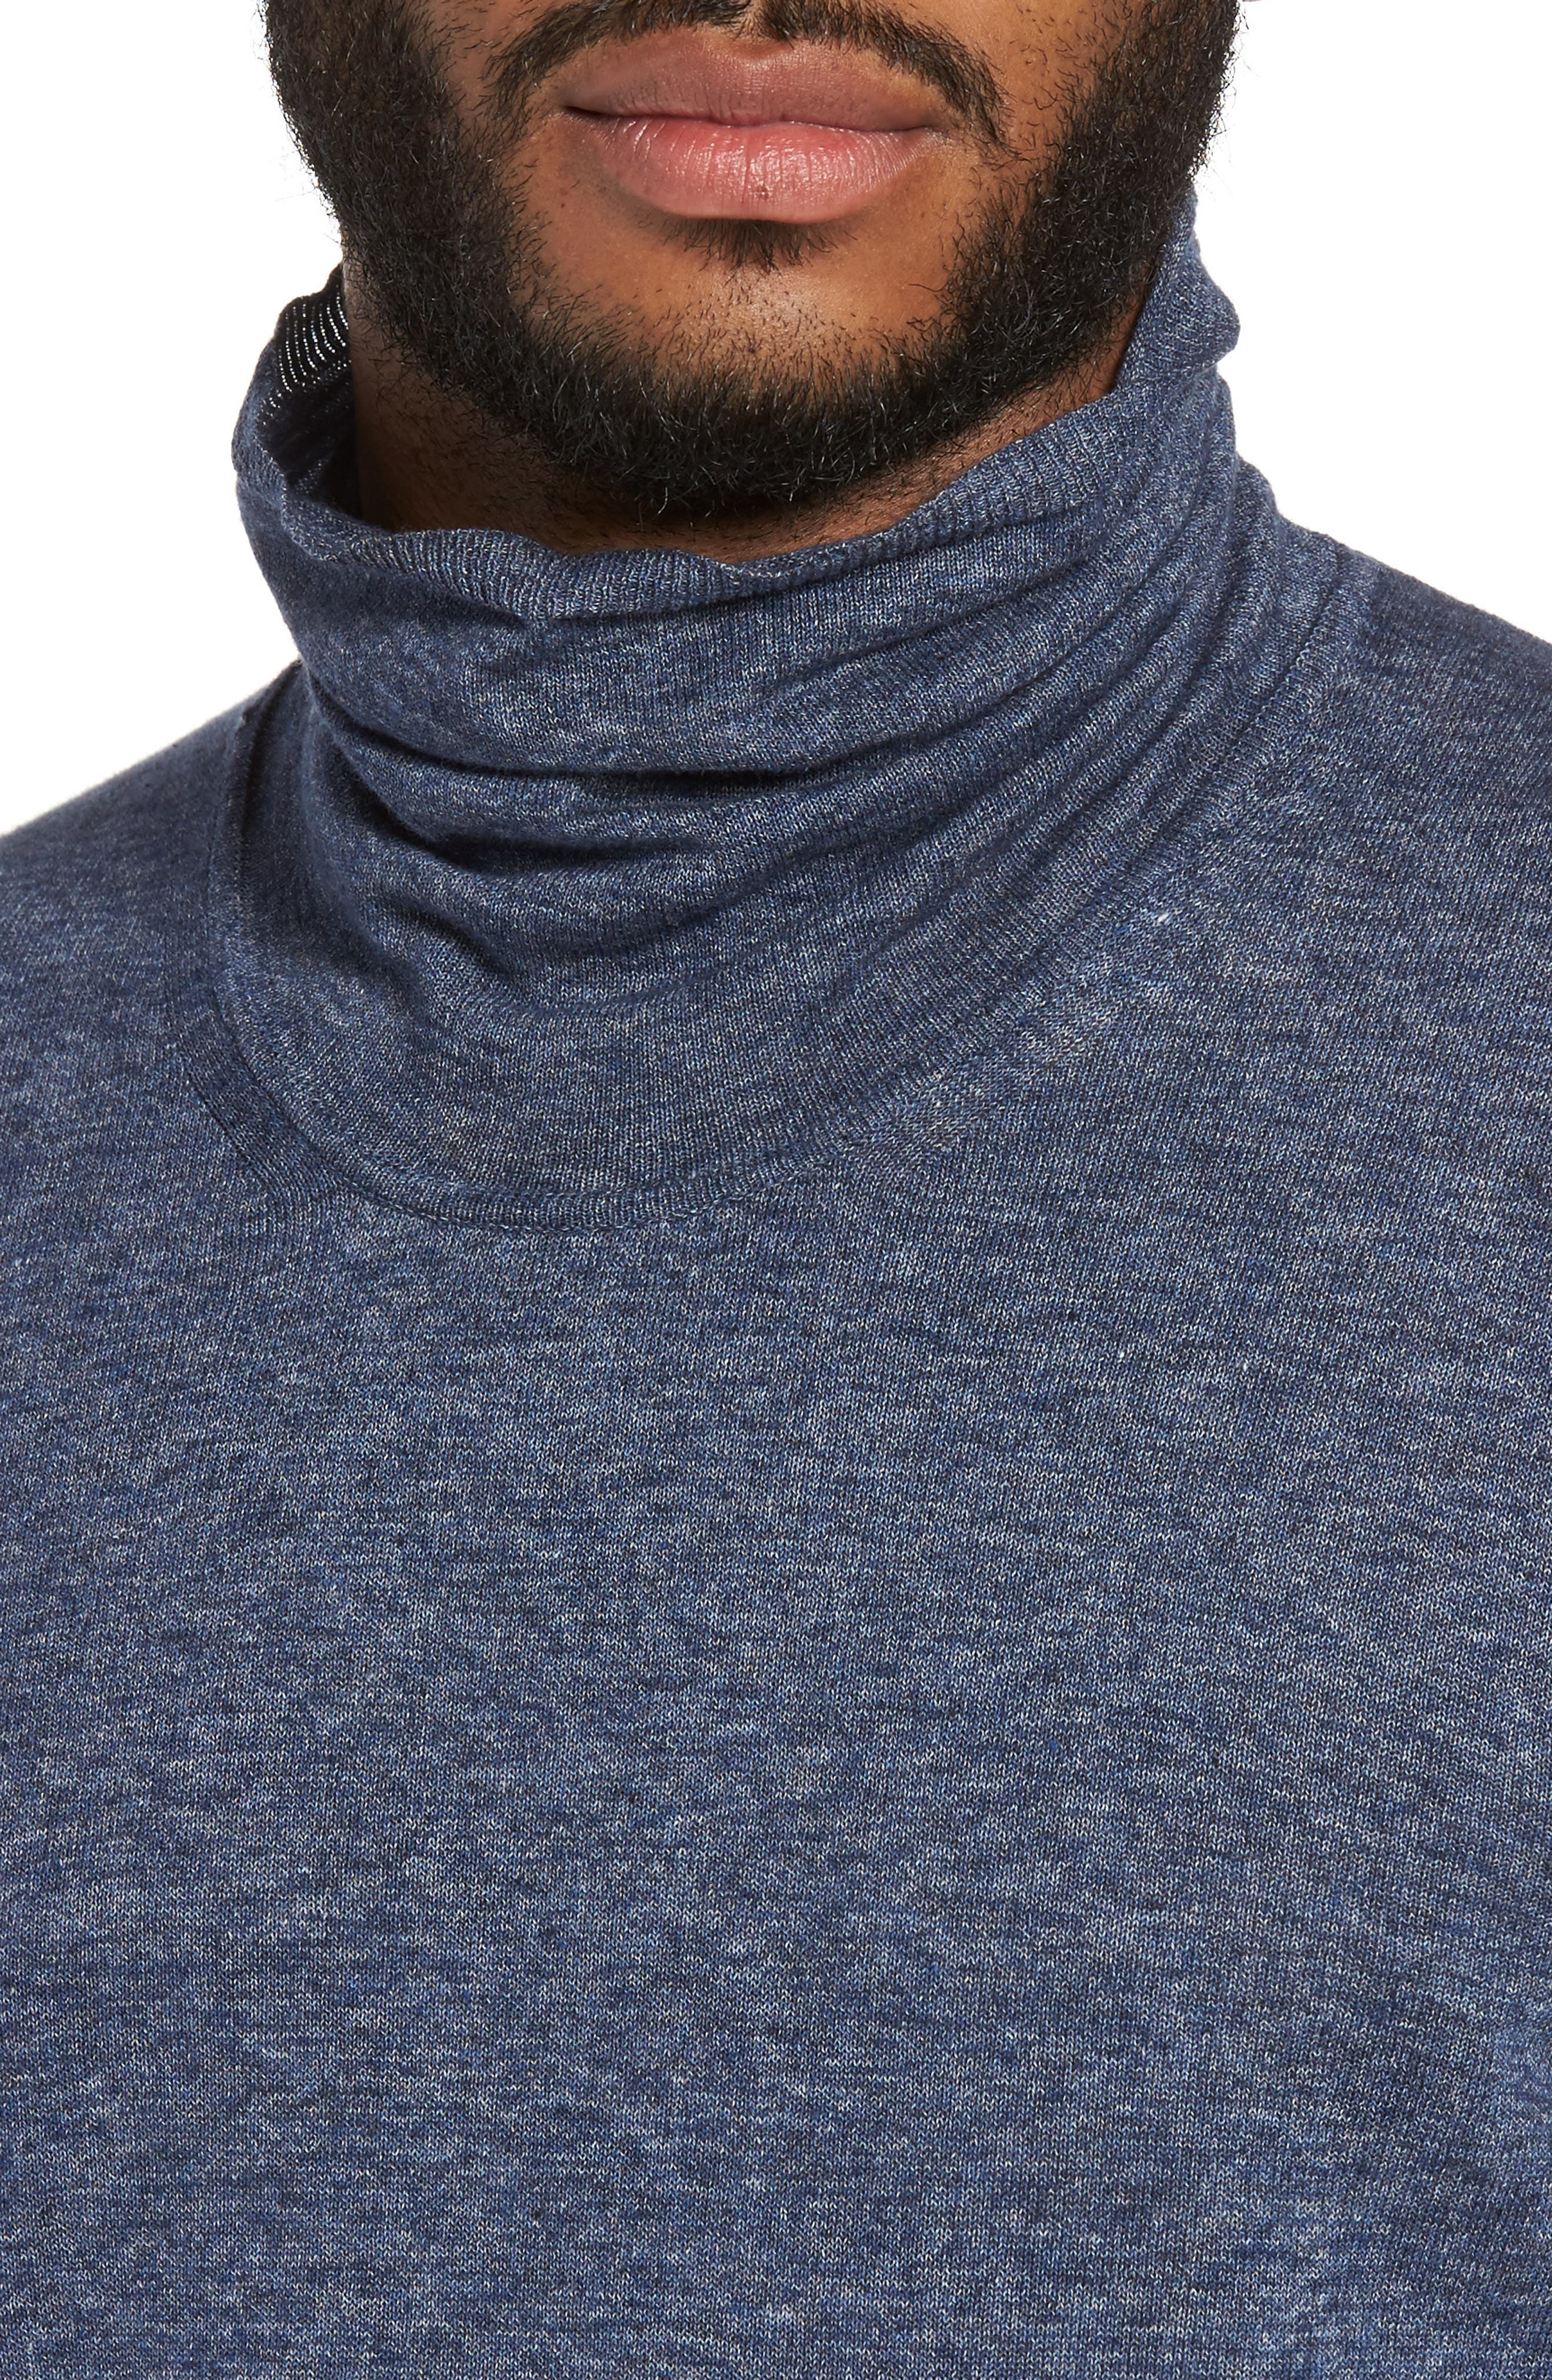 Hess Wool Turtleneck Sweater,                             Alternate thumbnail 8, color,